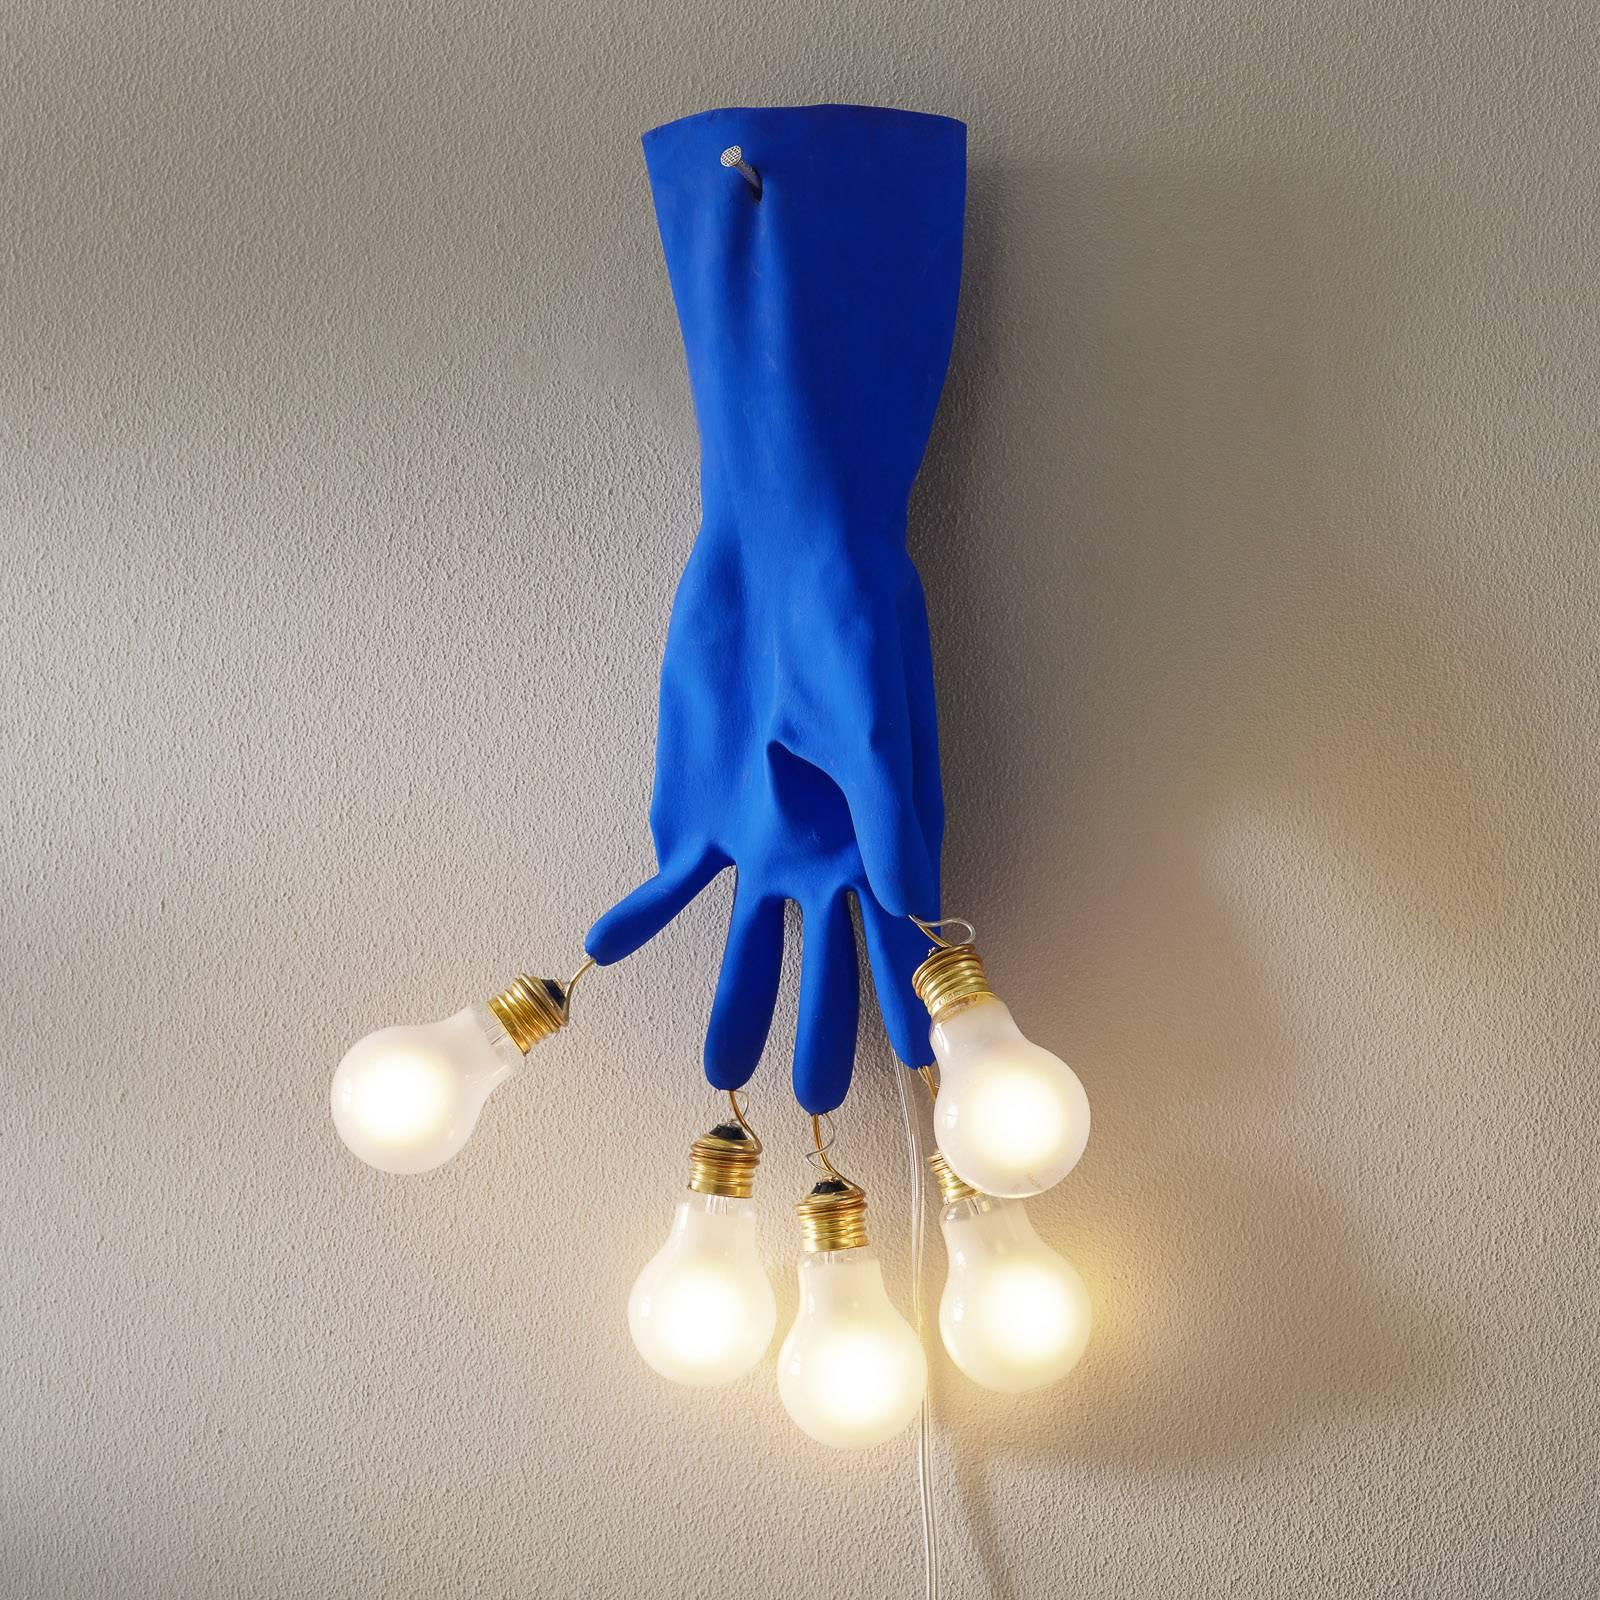 Ingo Maurer Luzy on the Wall applique LED